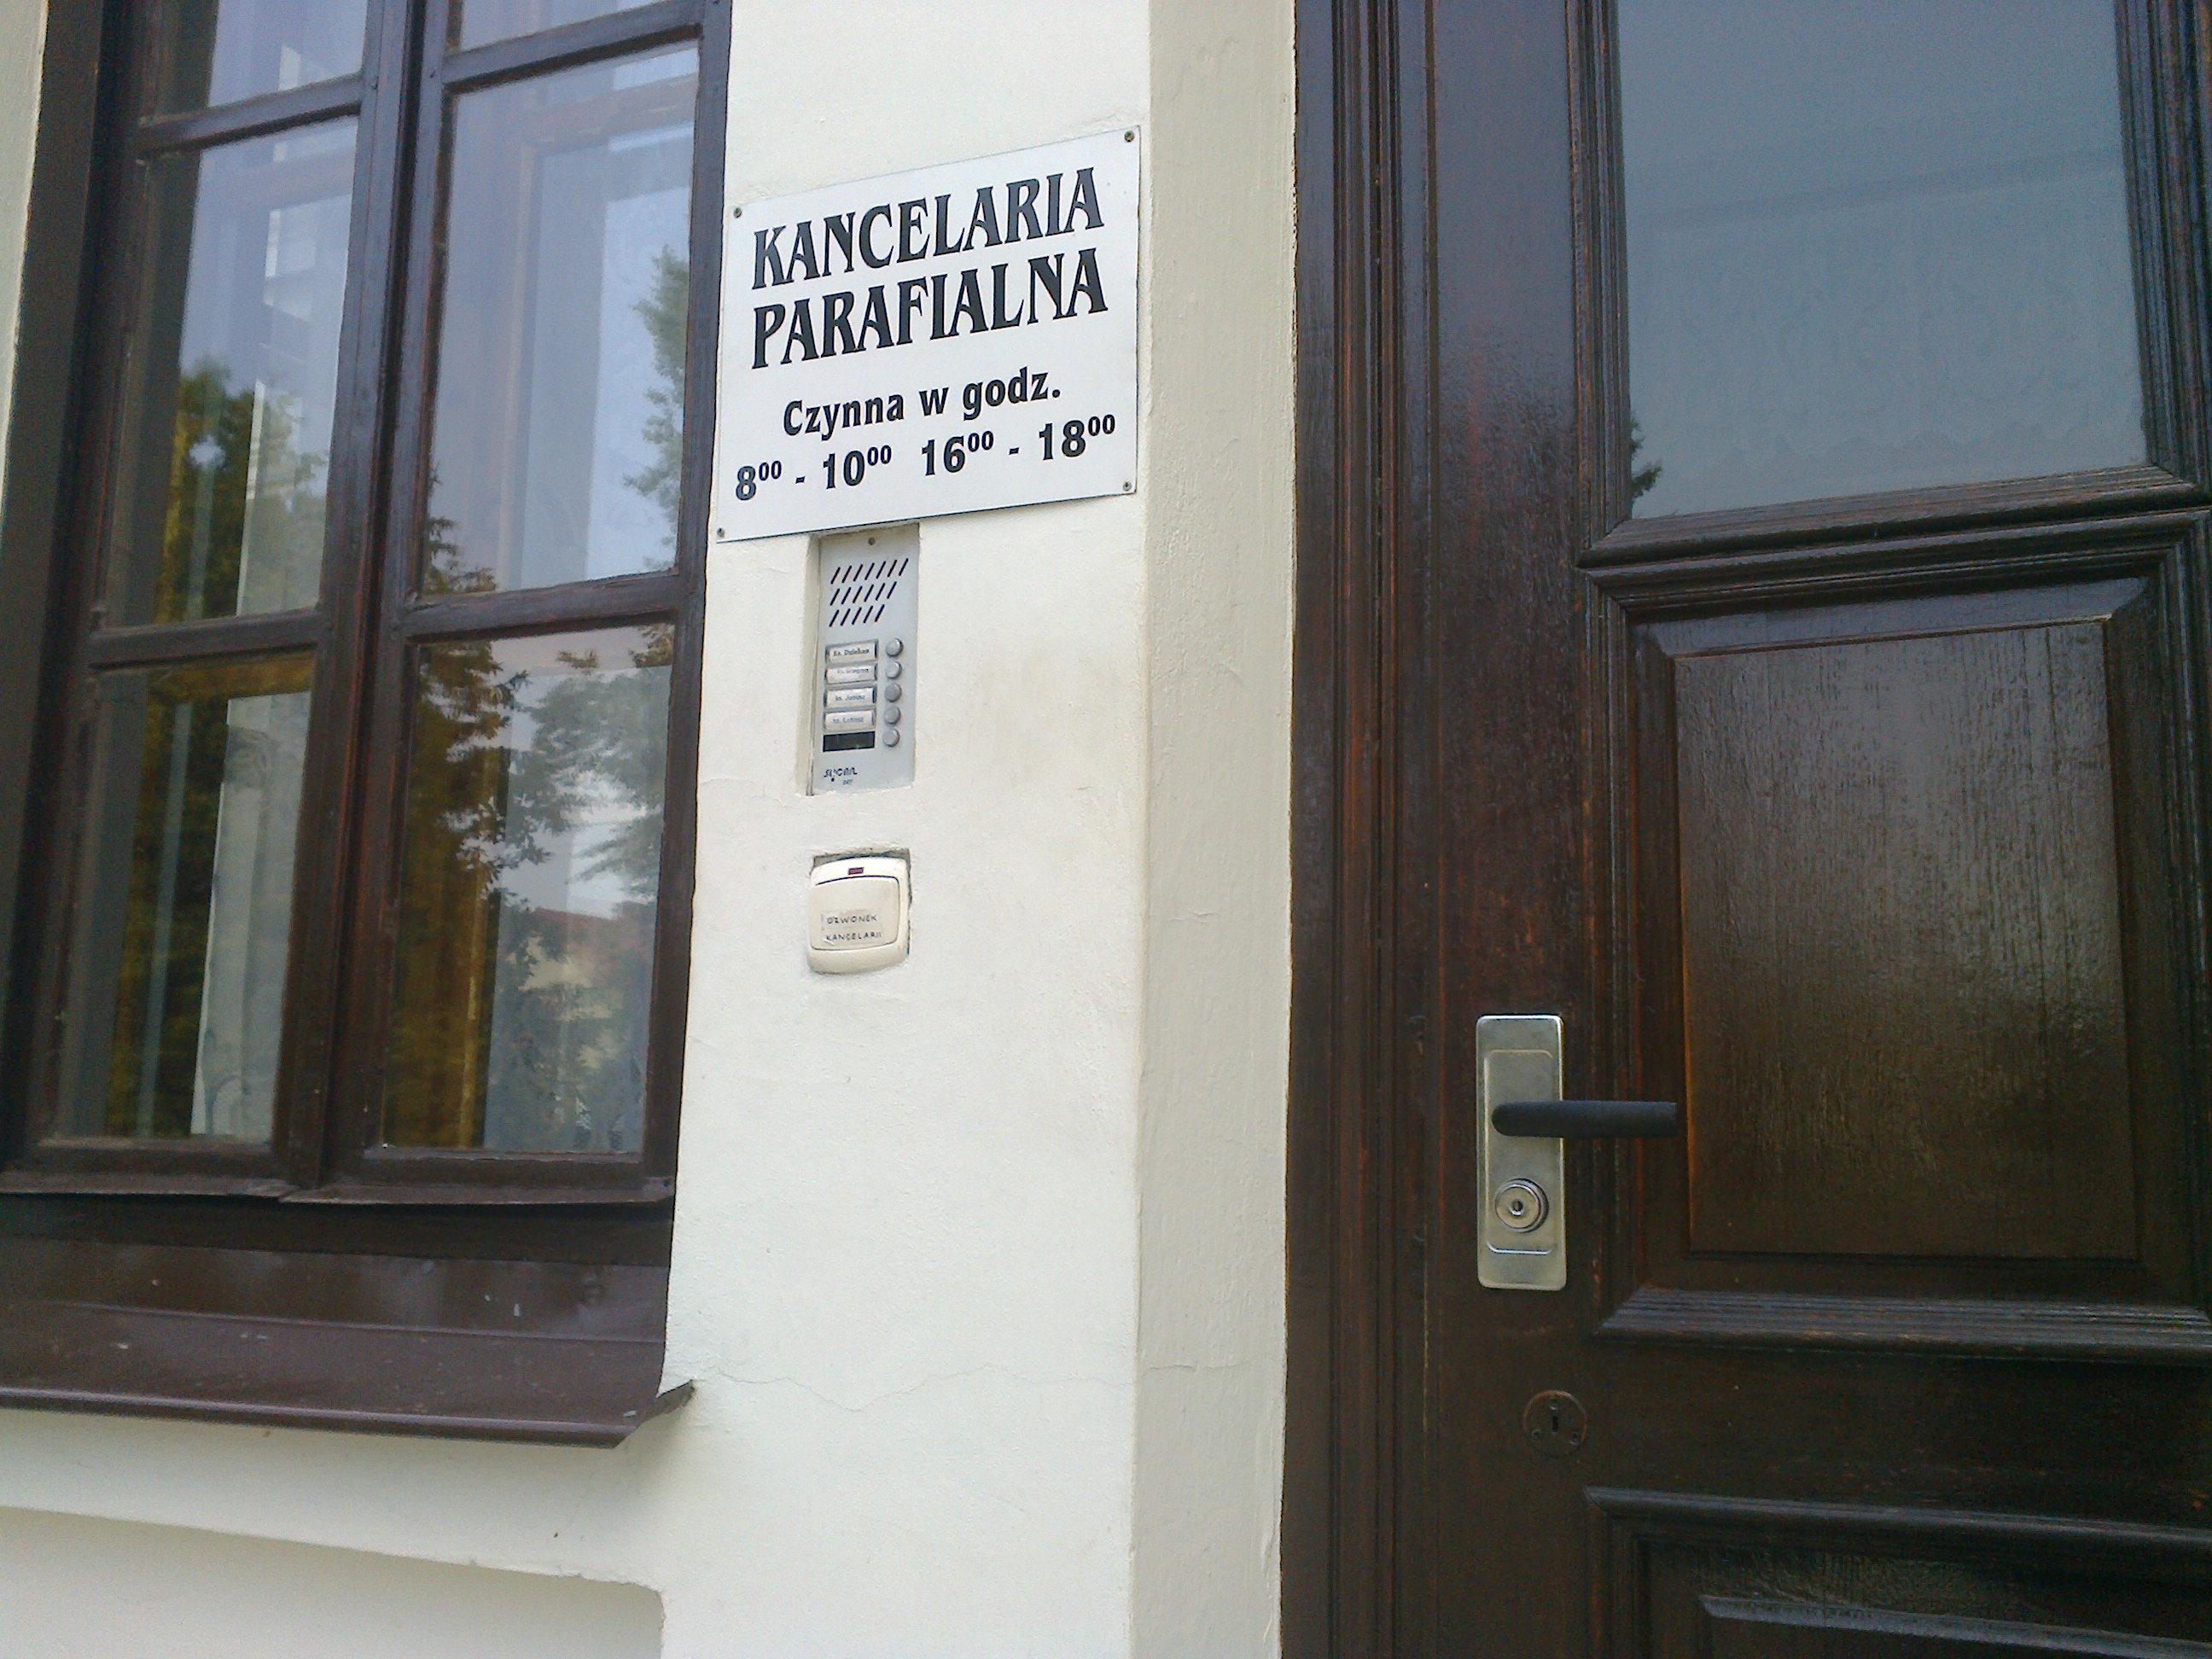 Kancelaria Parafialna